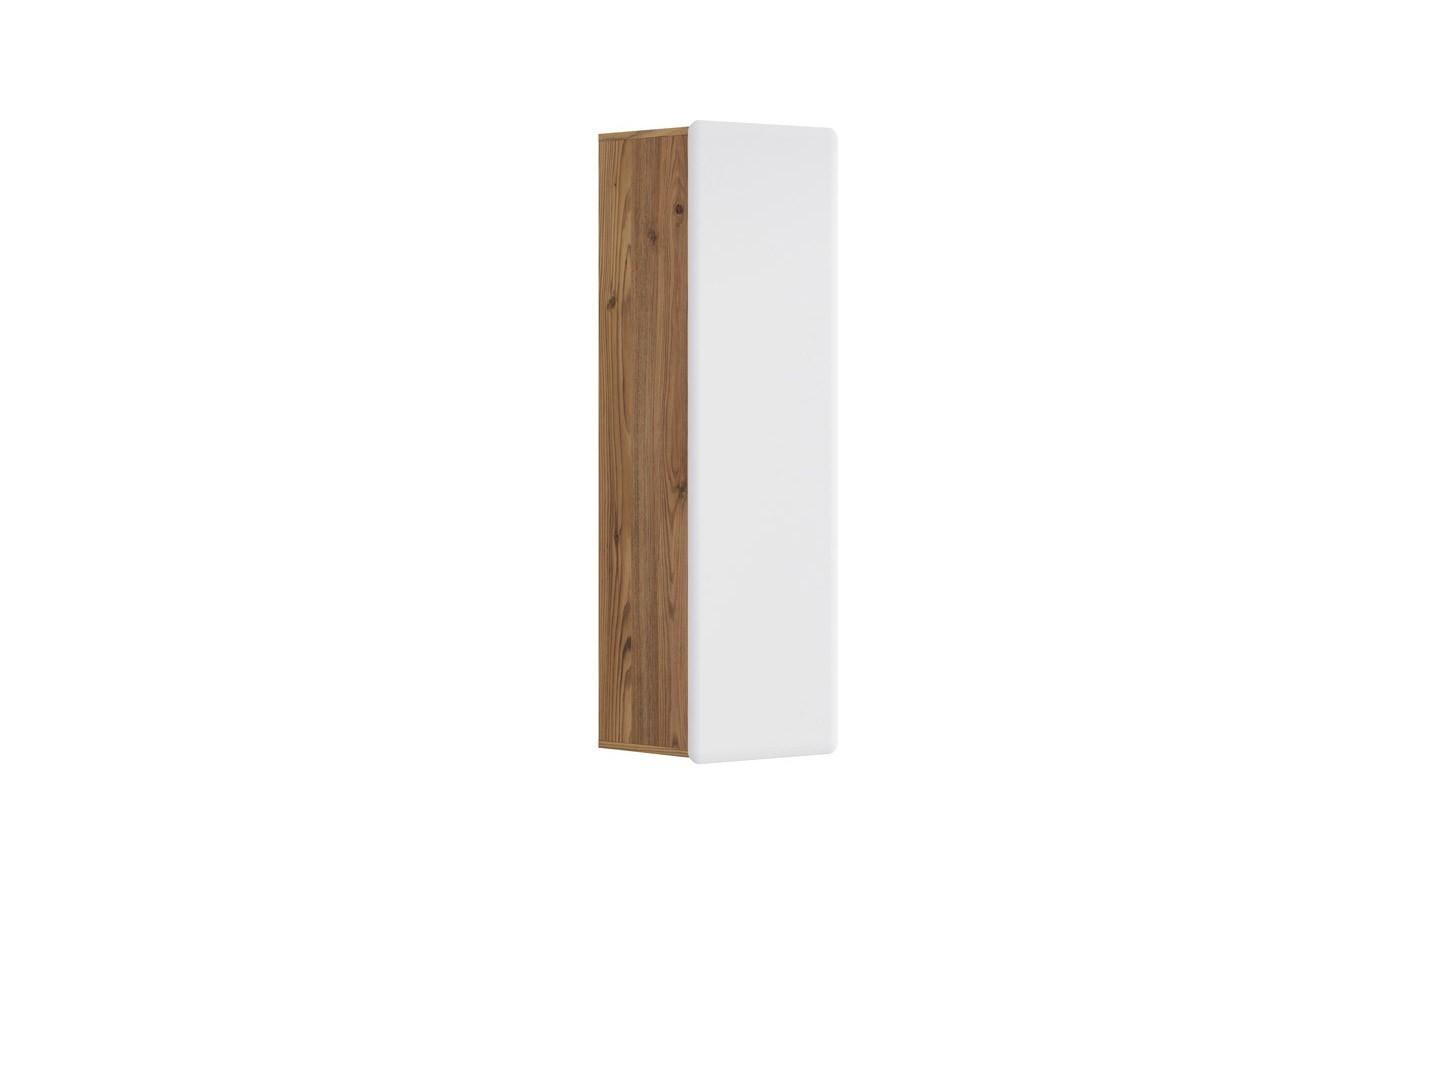 Skříňka na stěnu - BRW - Possi Light - SFW1D/13/4 (modřín sibiu zlatý + lesk bílý)